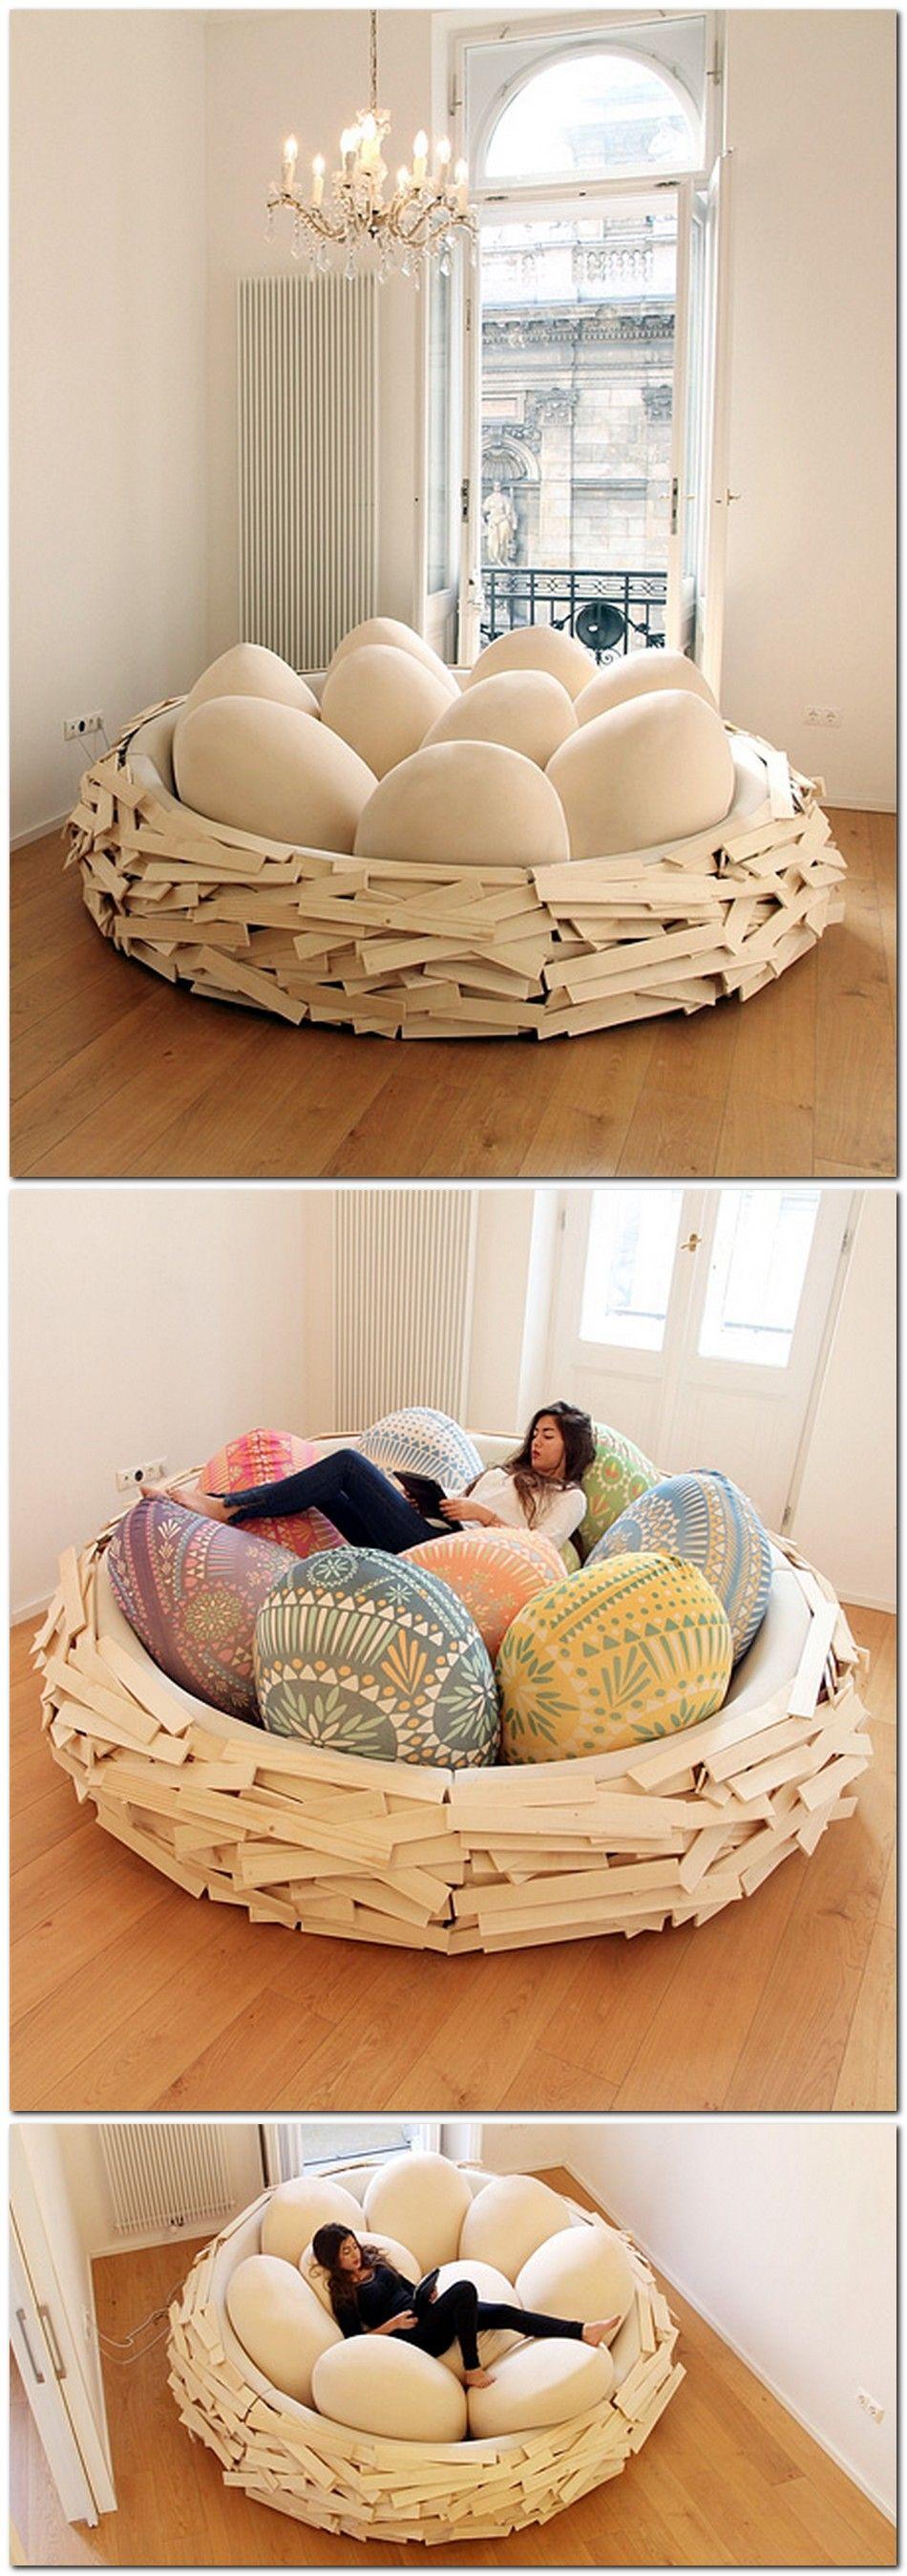 OGE Home Small space interior design, Bed design